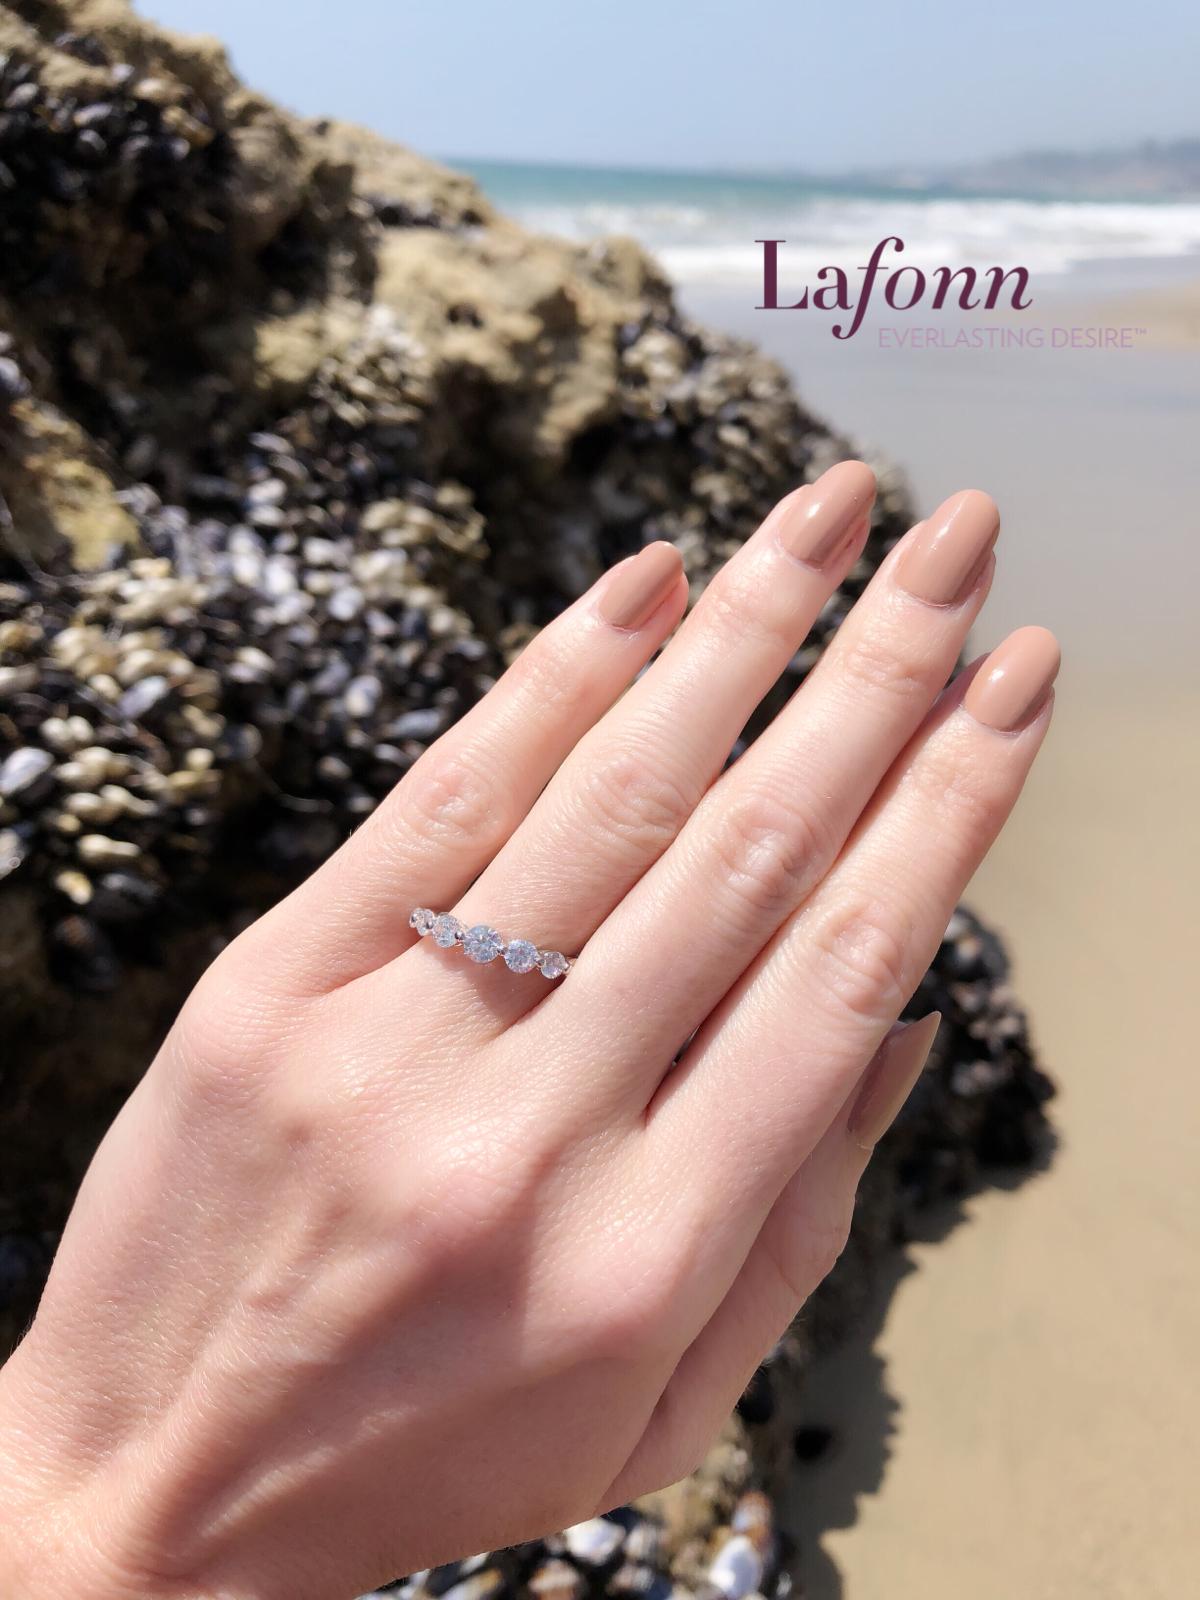 Lafonn 7 Symbols Of Joy Ring Rings Engagement Rings Jewelry Rings